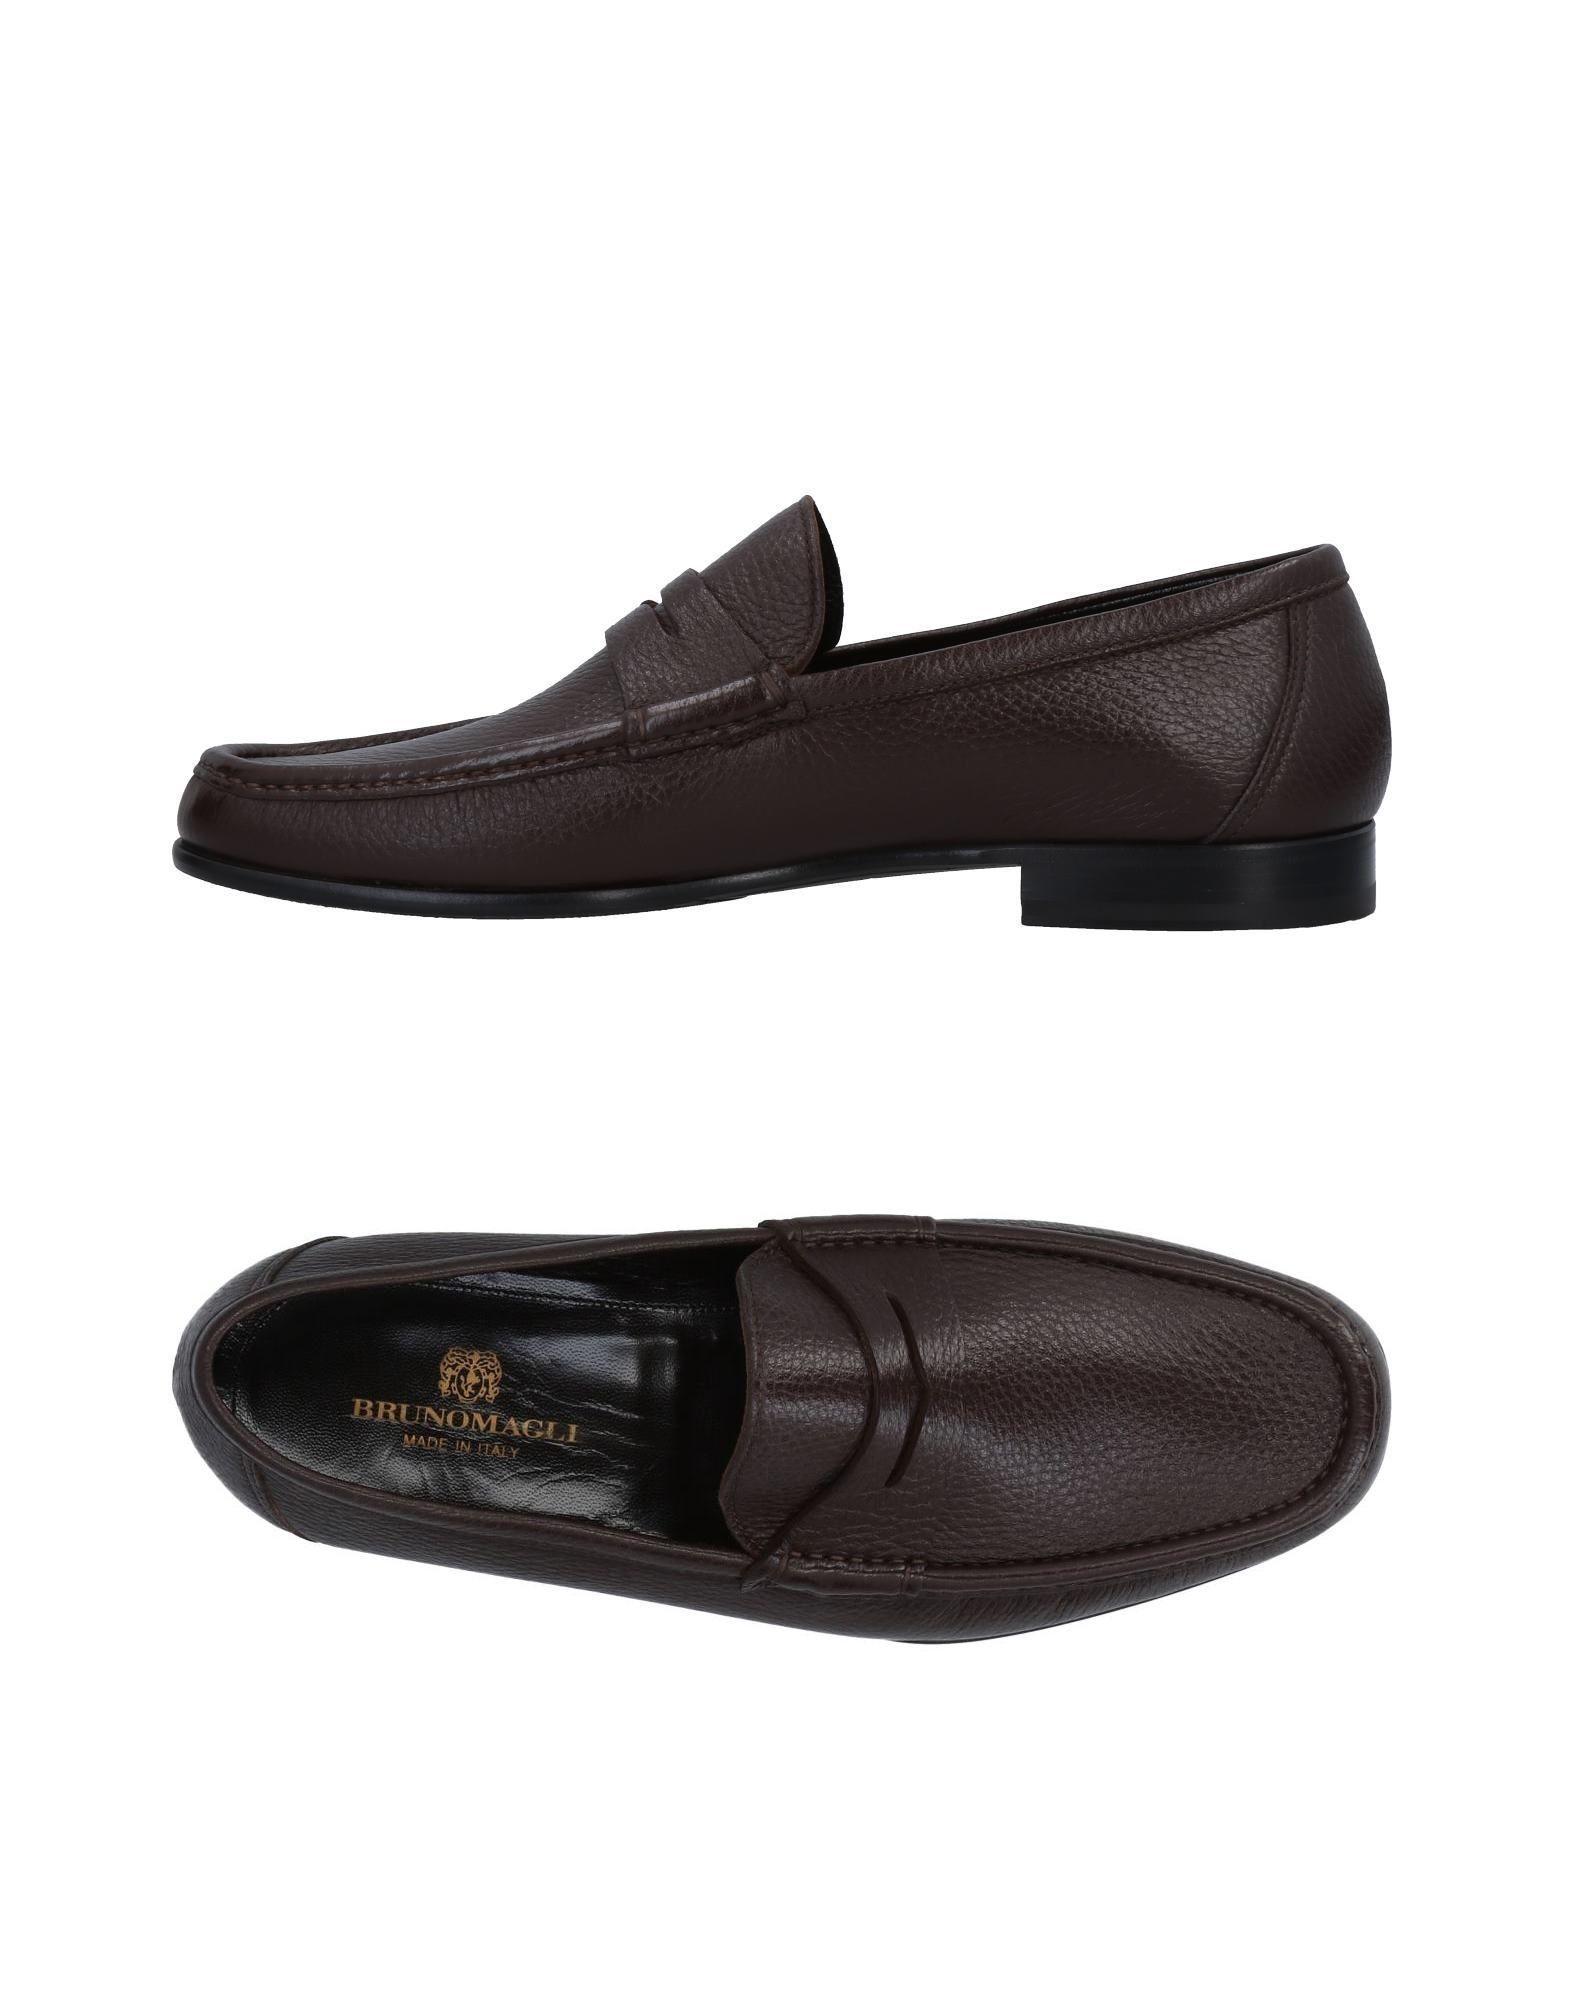 Bruno Magli Cocoa Textured Leather Loafers